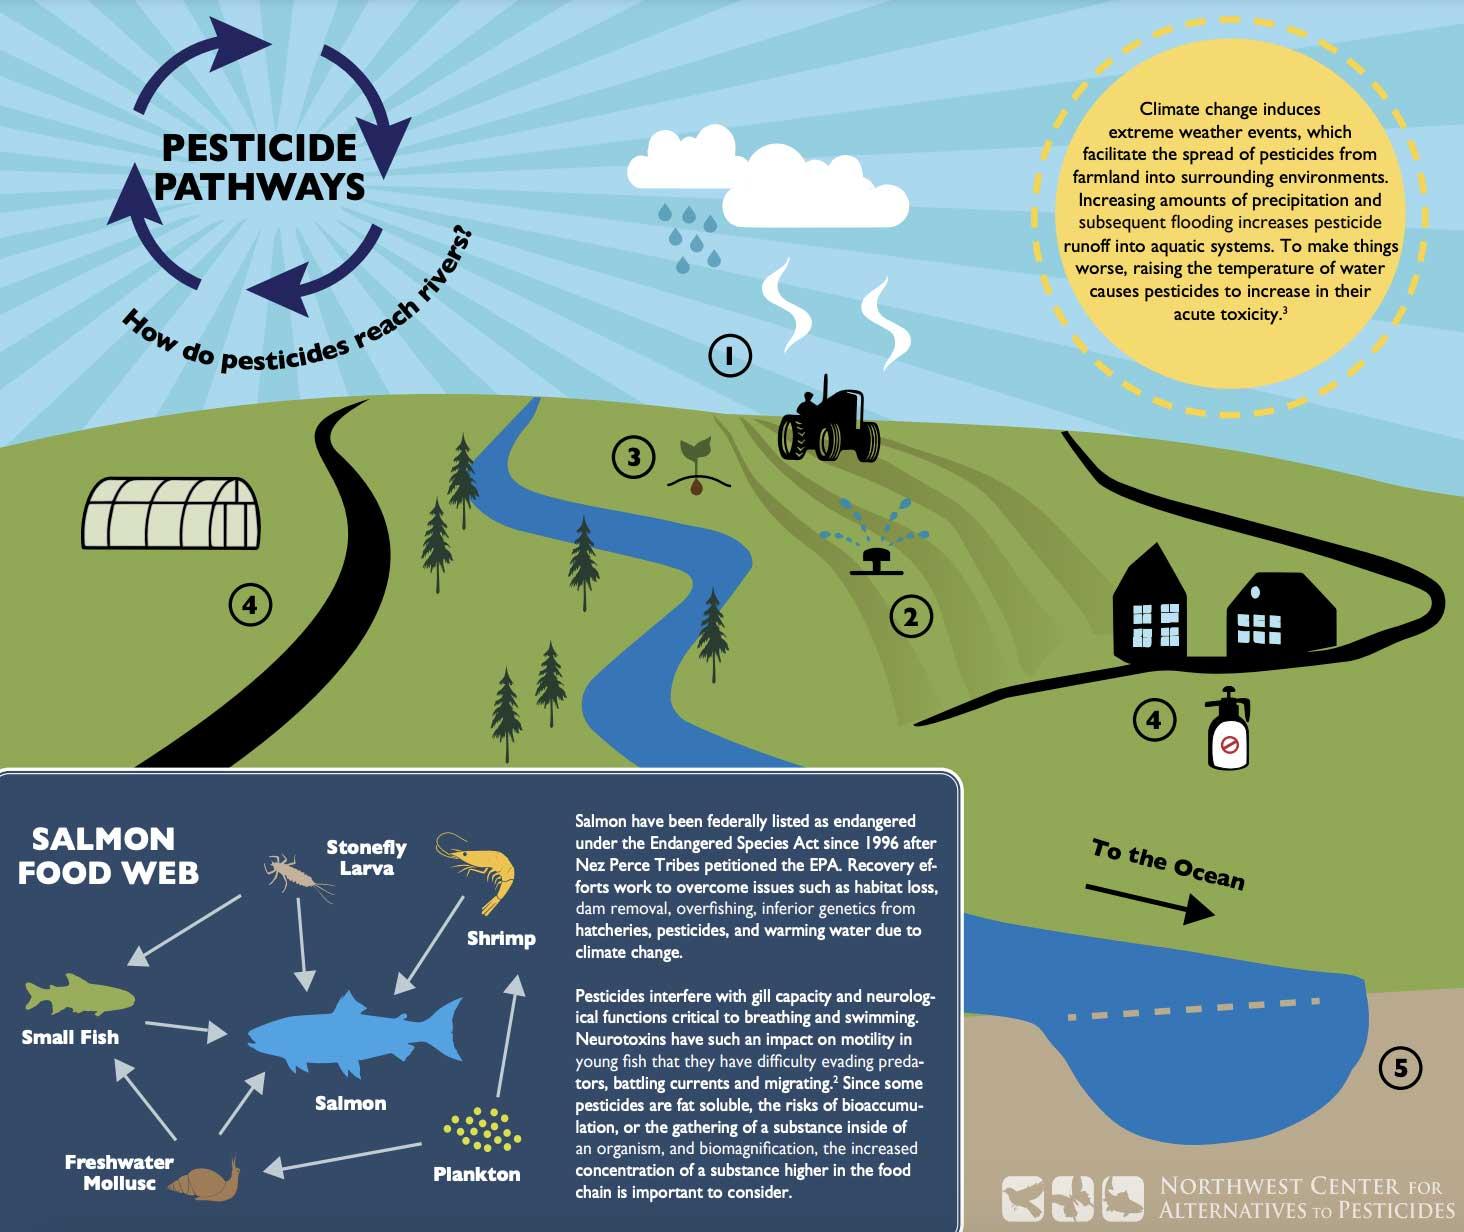 Pesticide pathways showing how pesticides reach rivers